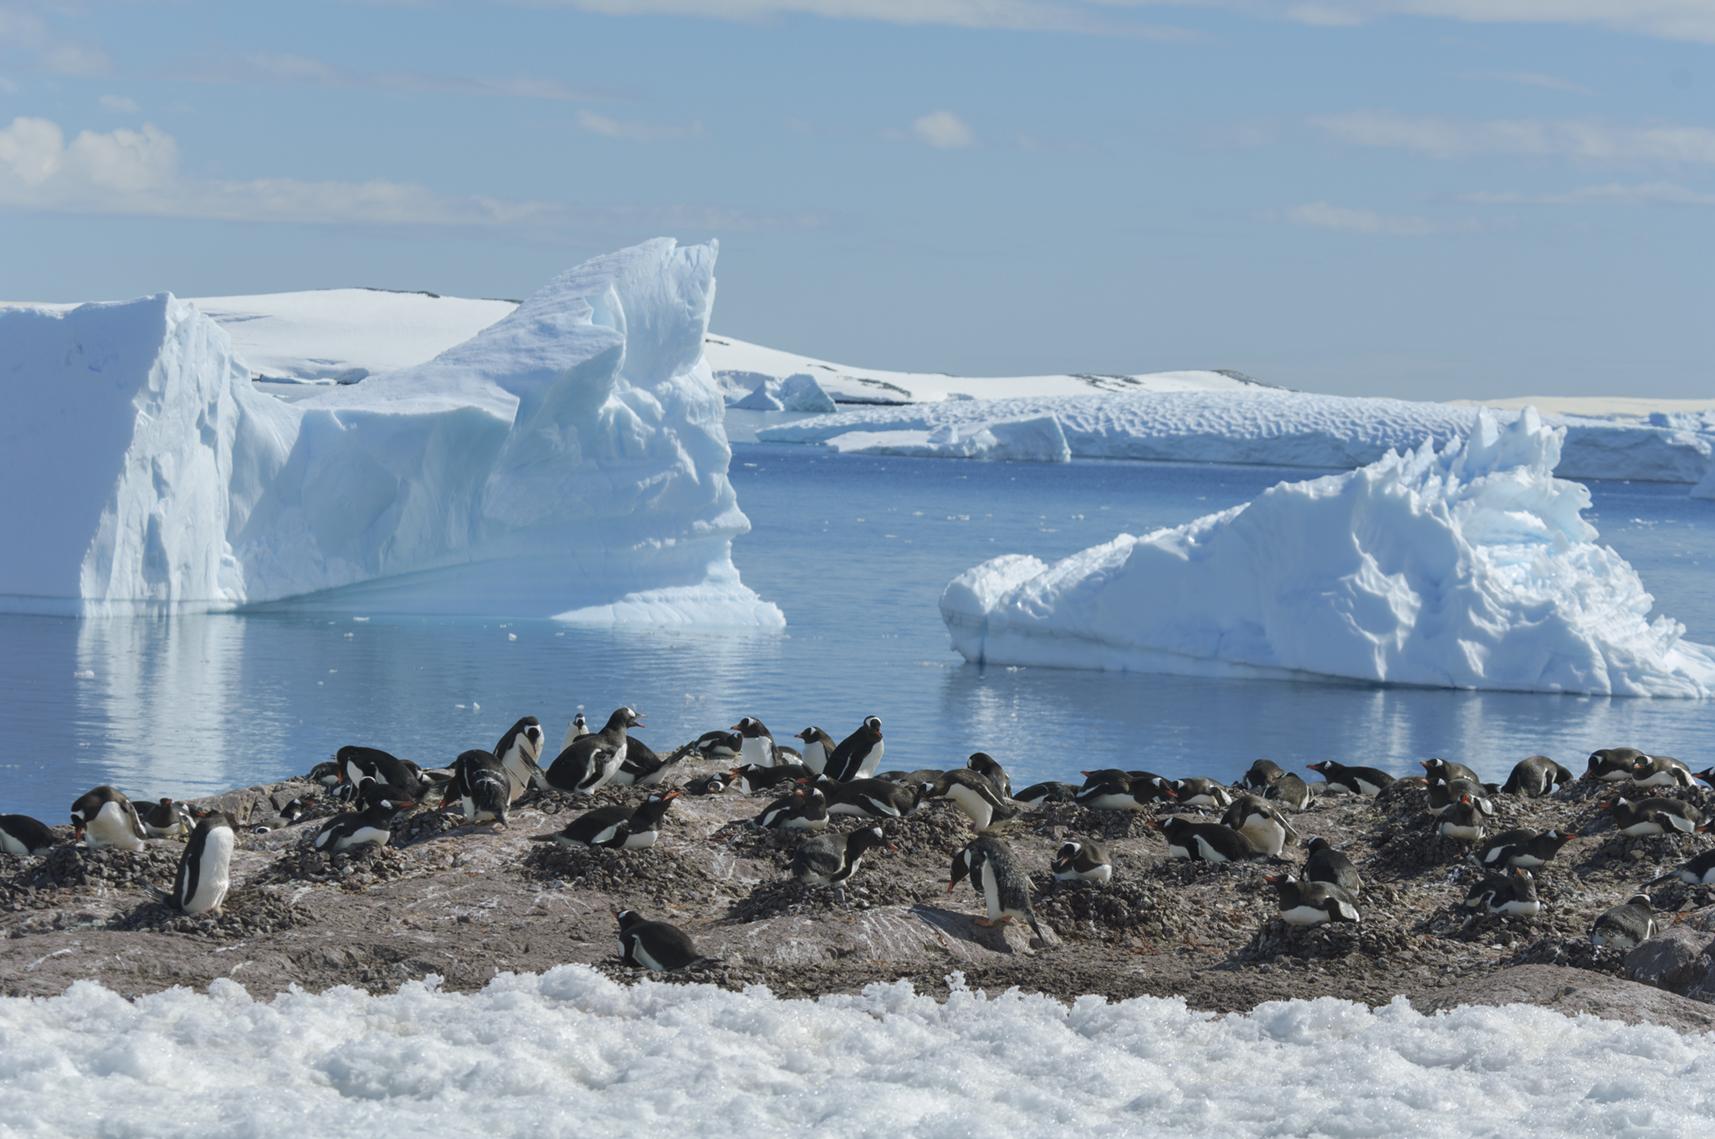 Cuverville Islands, Antartica. 2005